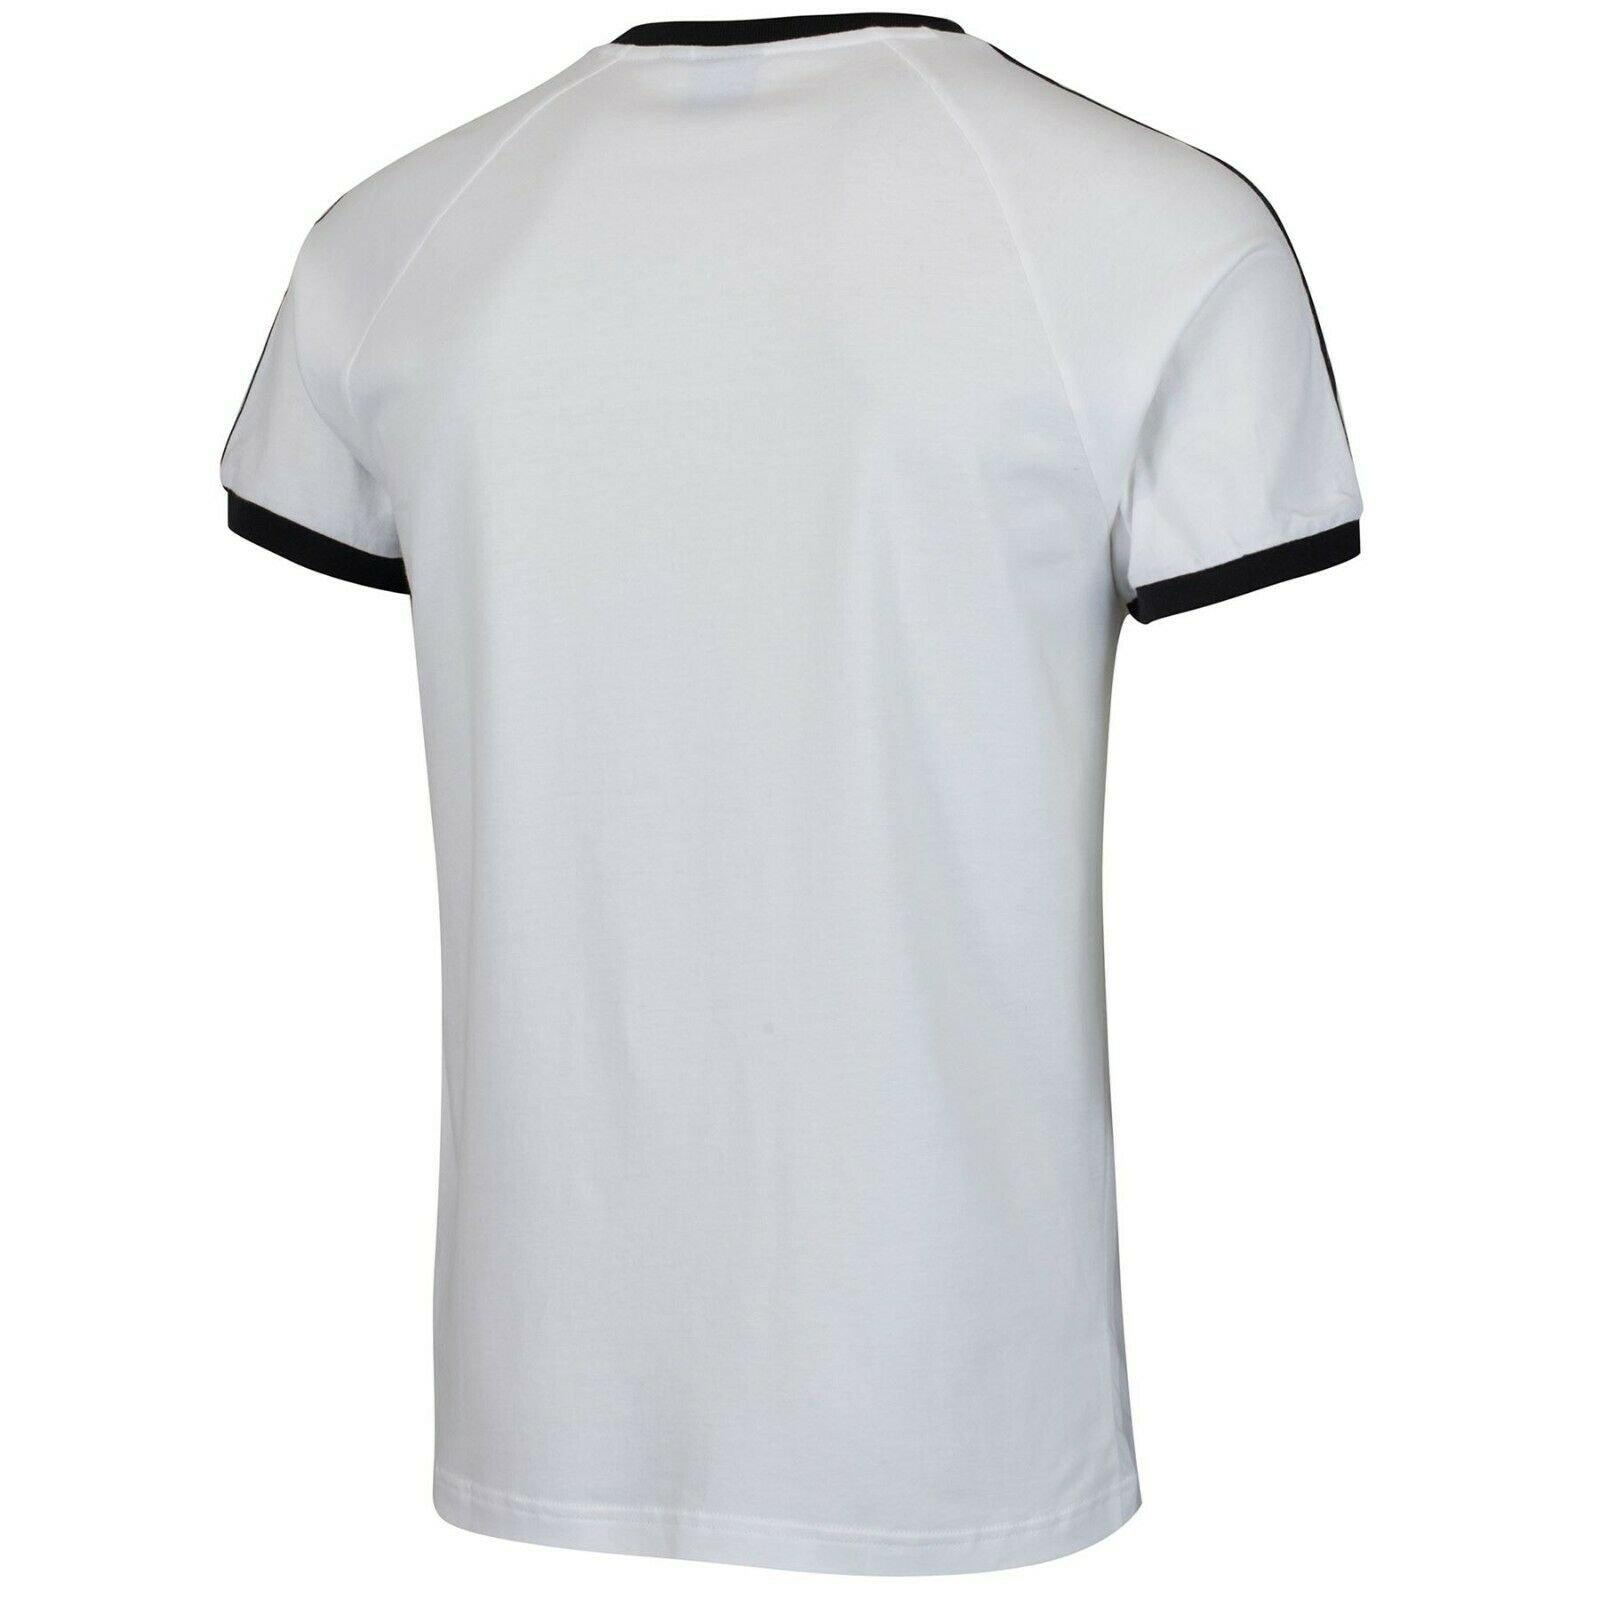 thumbnail 13 - Adidas Originals California Men's T-Shirt Trefoil Retro 3-Stripes Short Sleeve